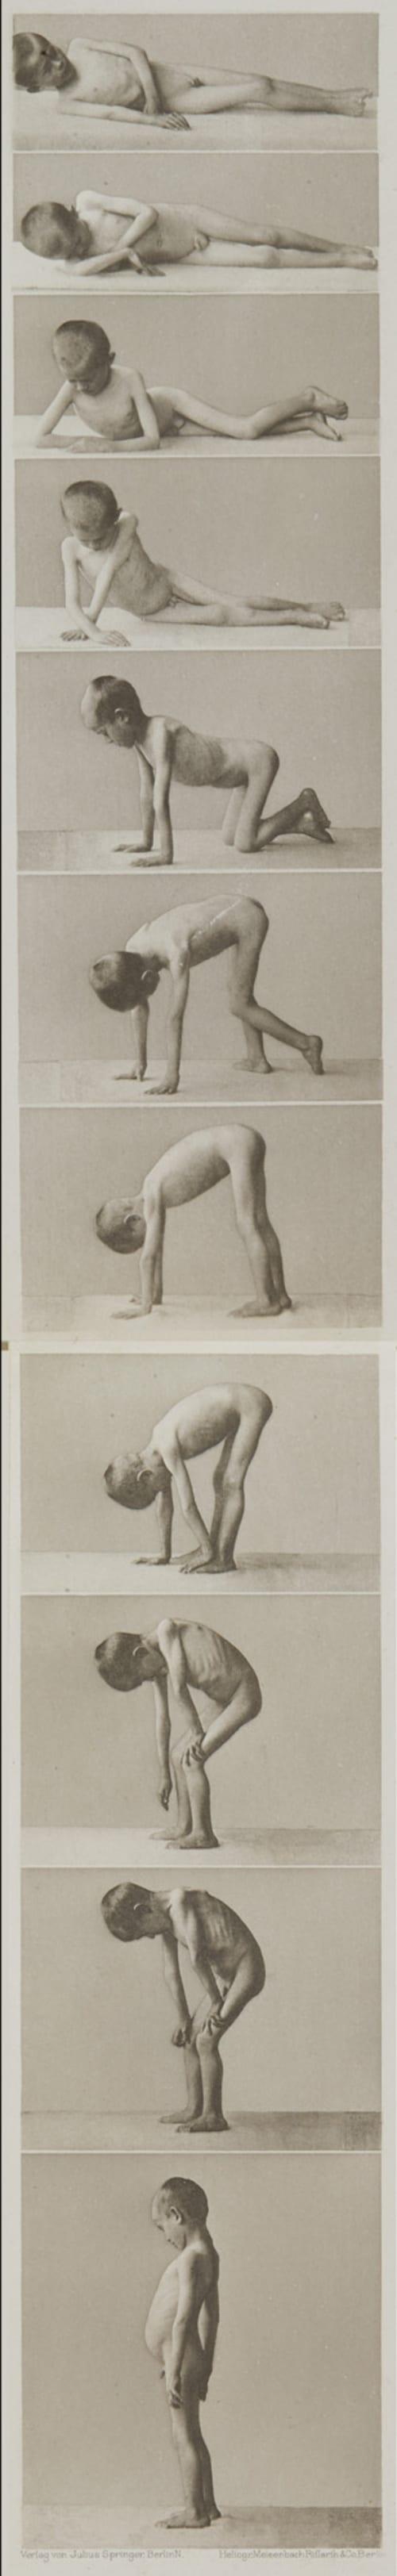 Tafel 8-9 Curschmann, Dr. H.   (German, 1846-1910)